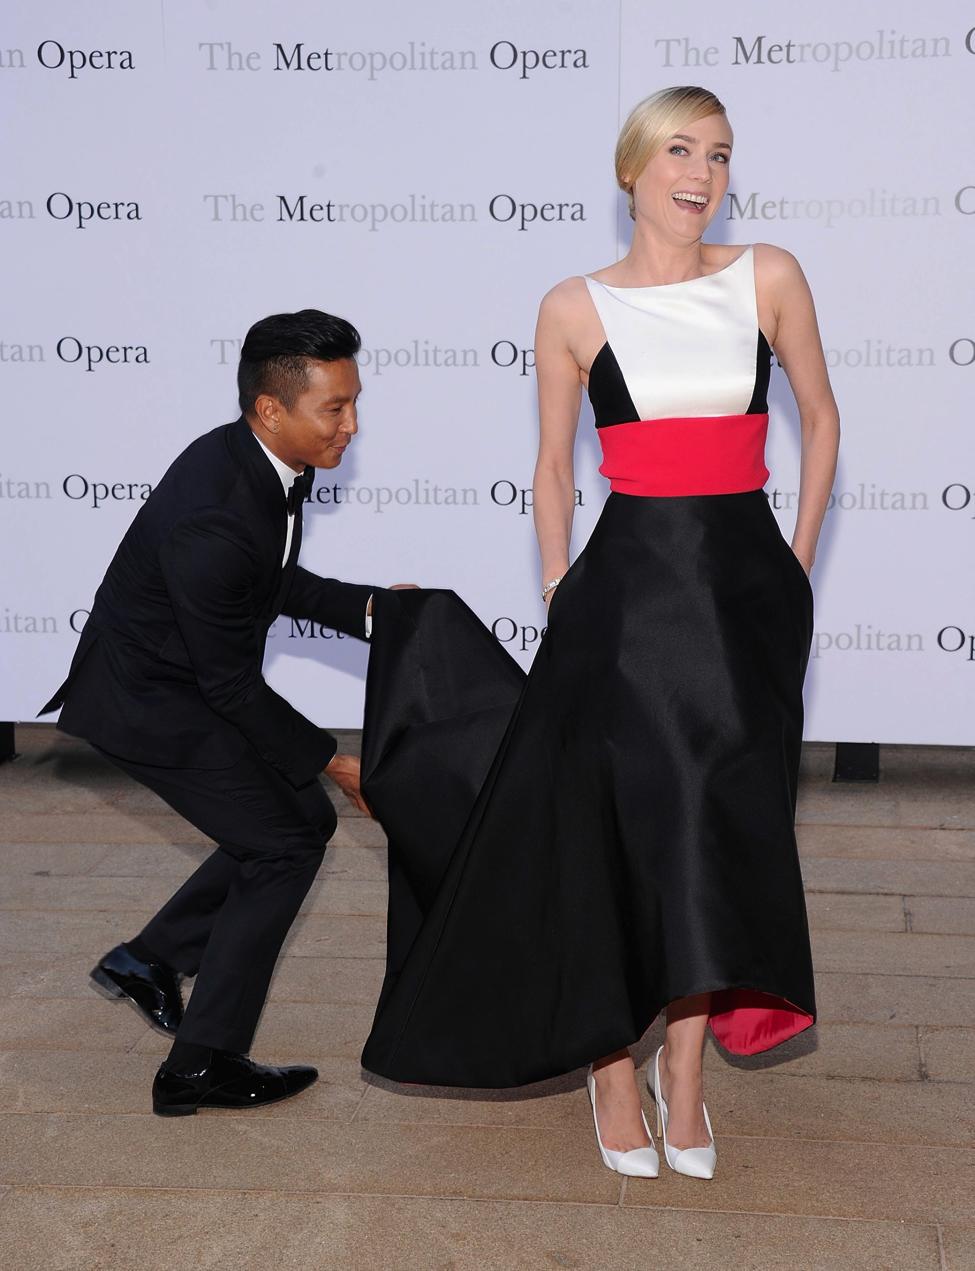 Designer Prabal Gurung accompanies actress Diane Kruger, who is wearing one of his designs, on the red carpet. Image via  Pop Sugar